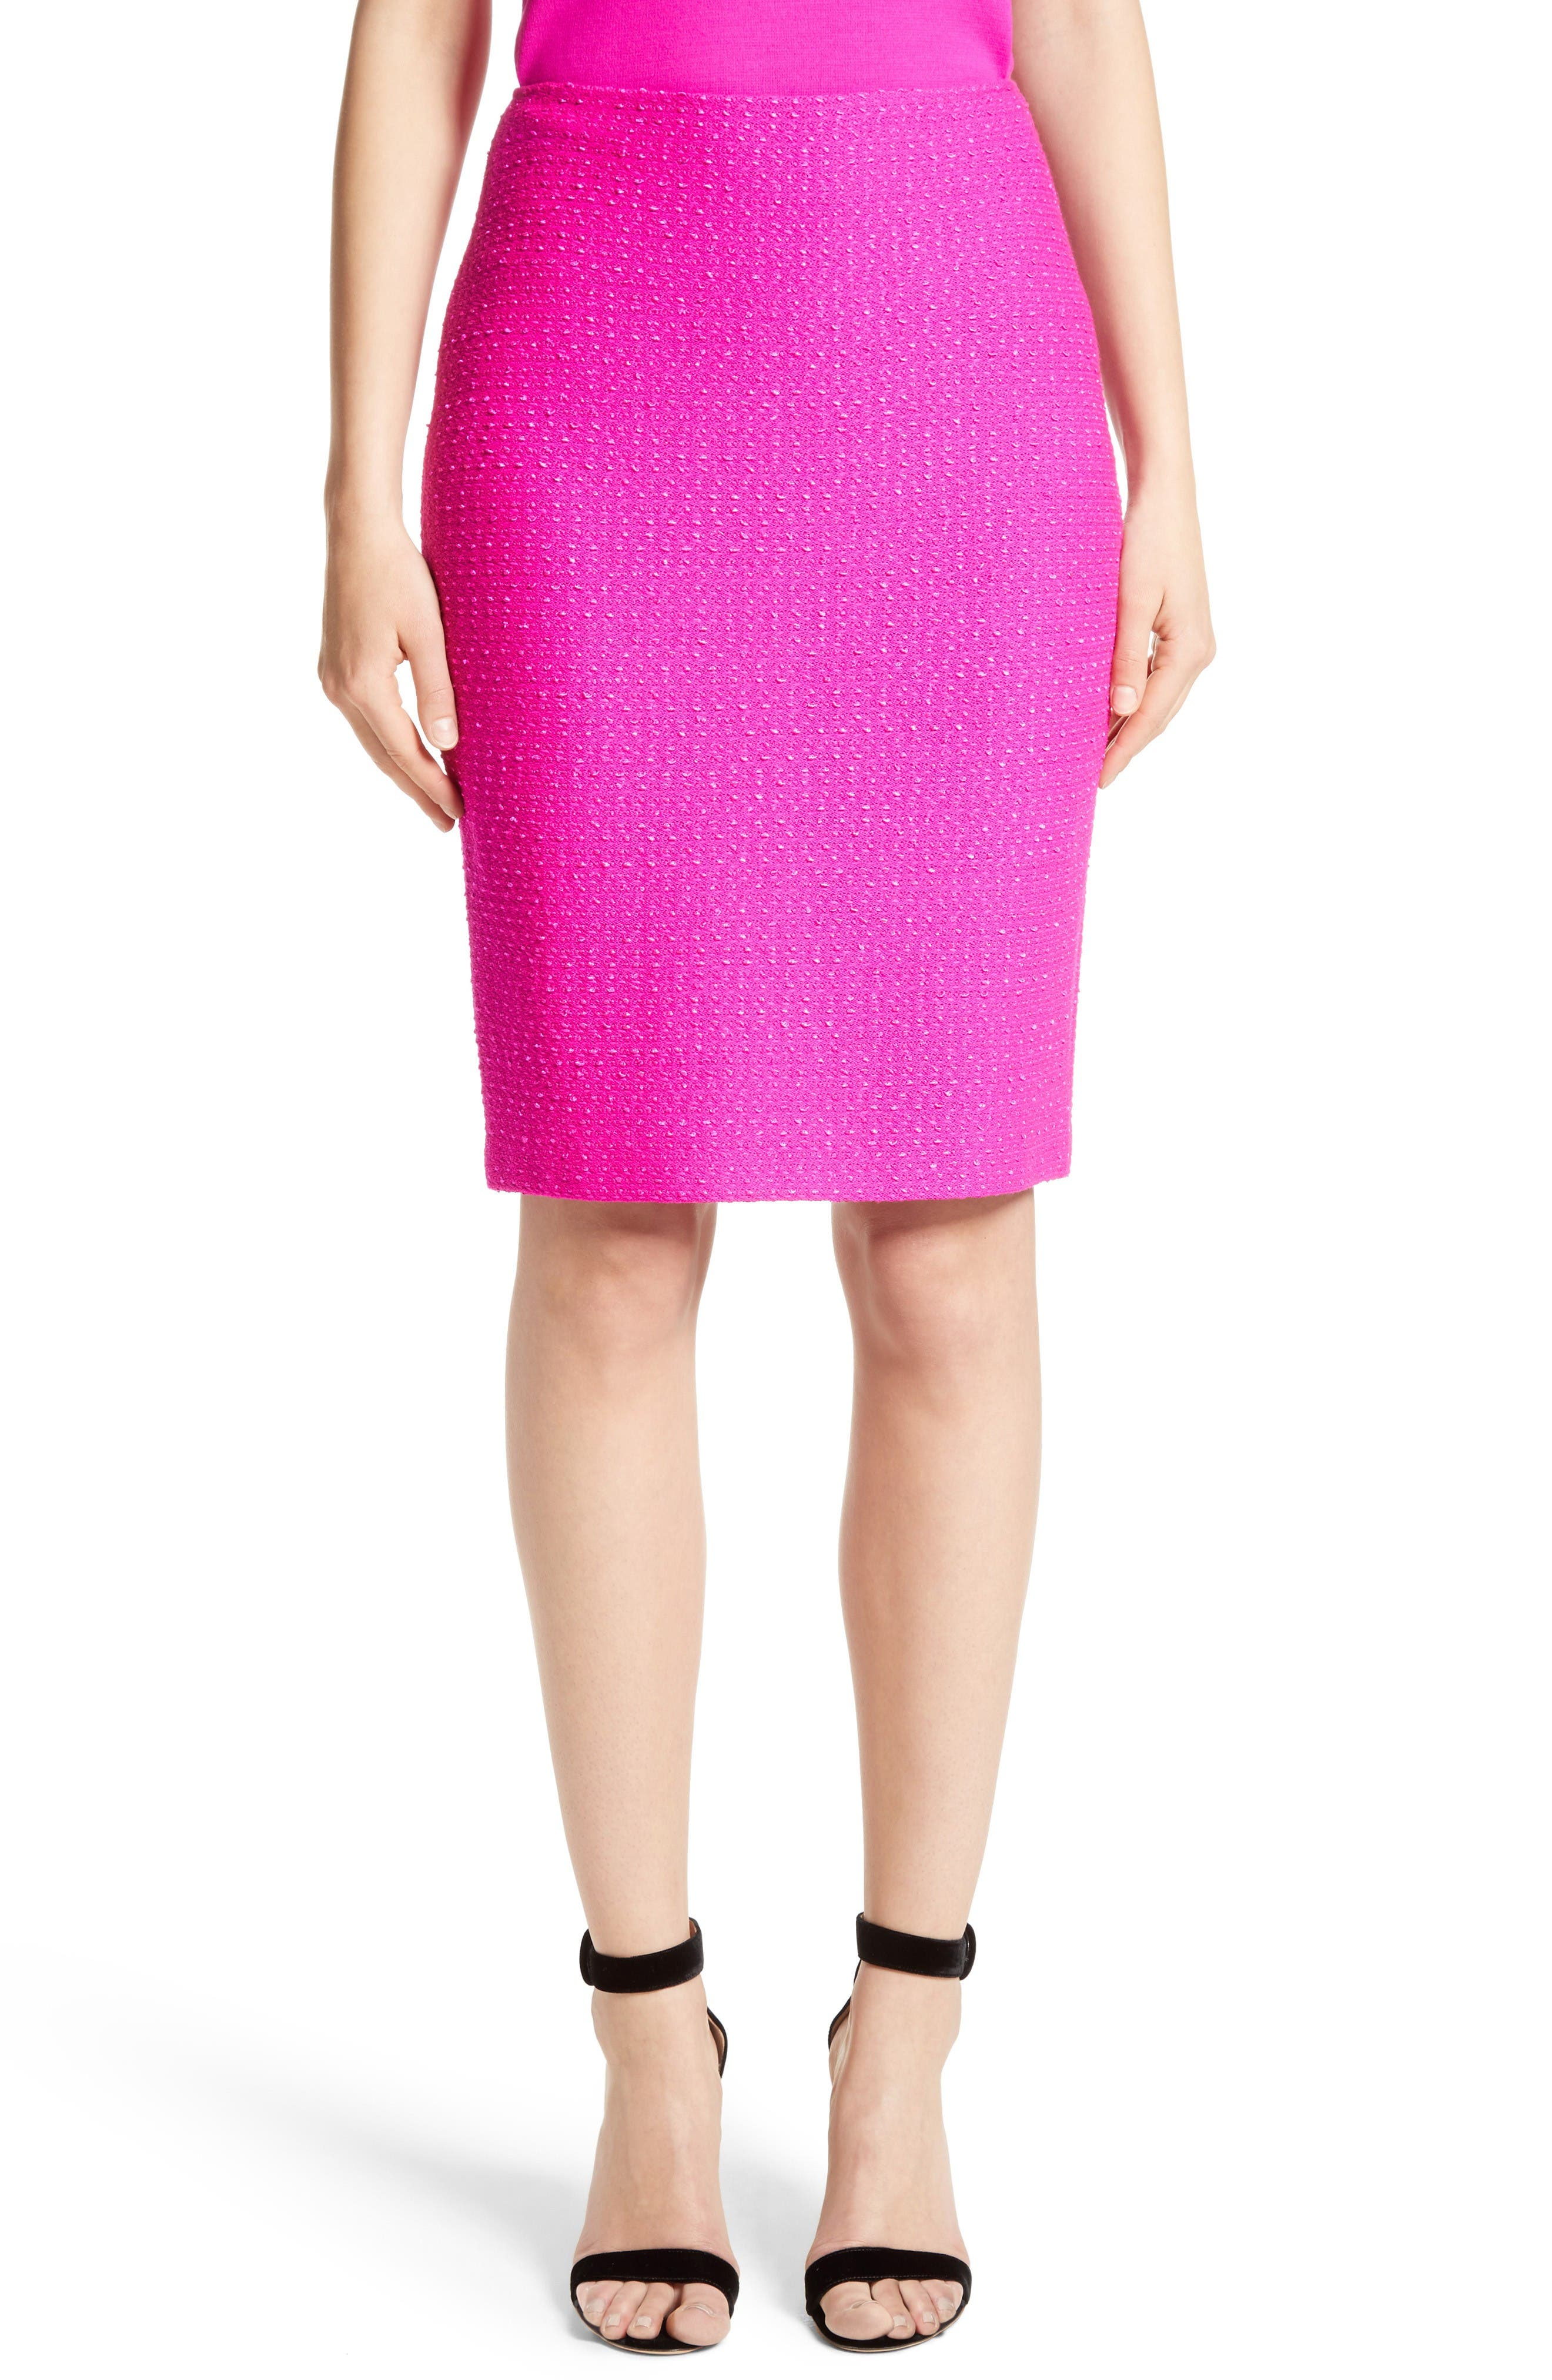 Alternate Image 1 Selected - St. John Collection Ribbon Texture Knit Skirt